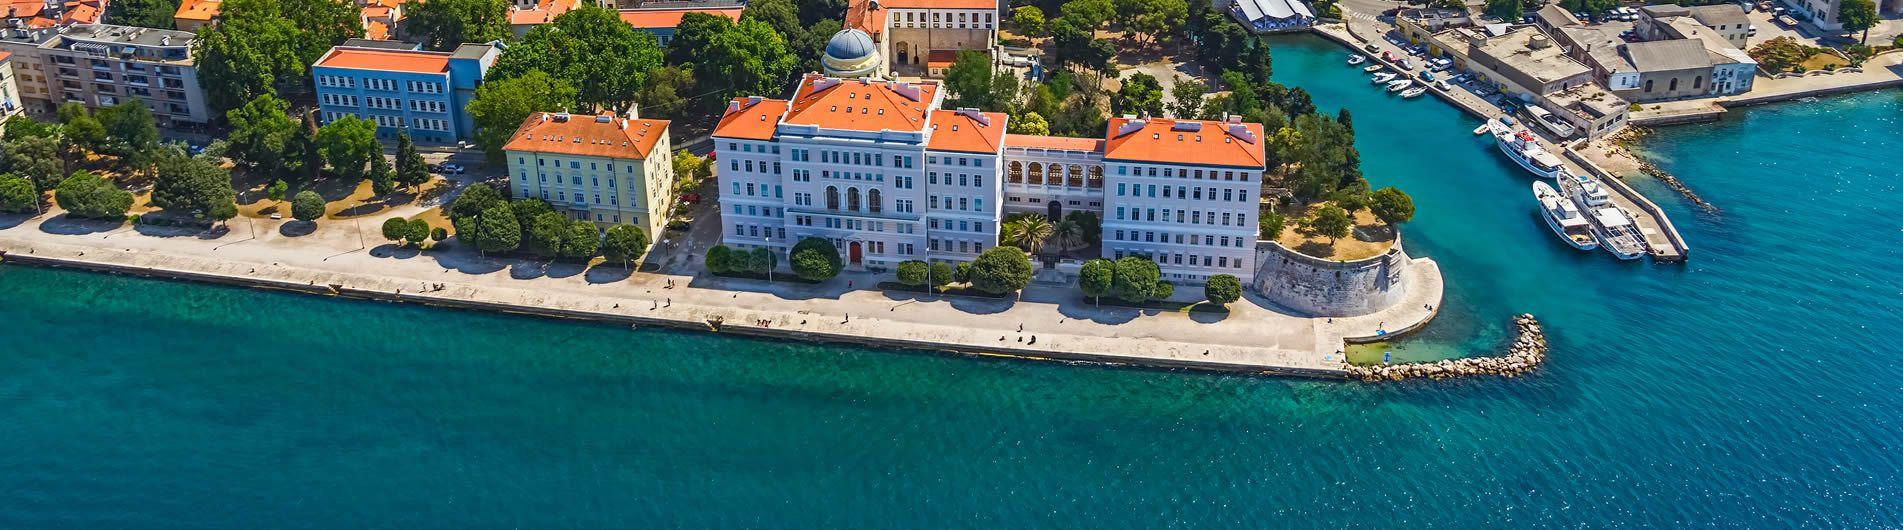 City Tour of Zadar, Croatia